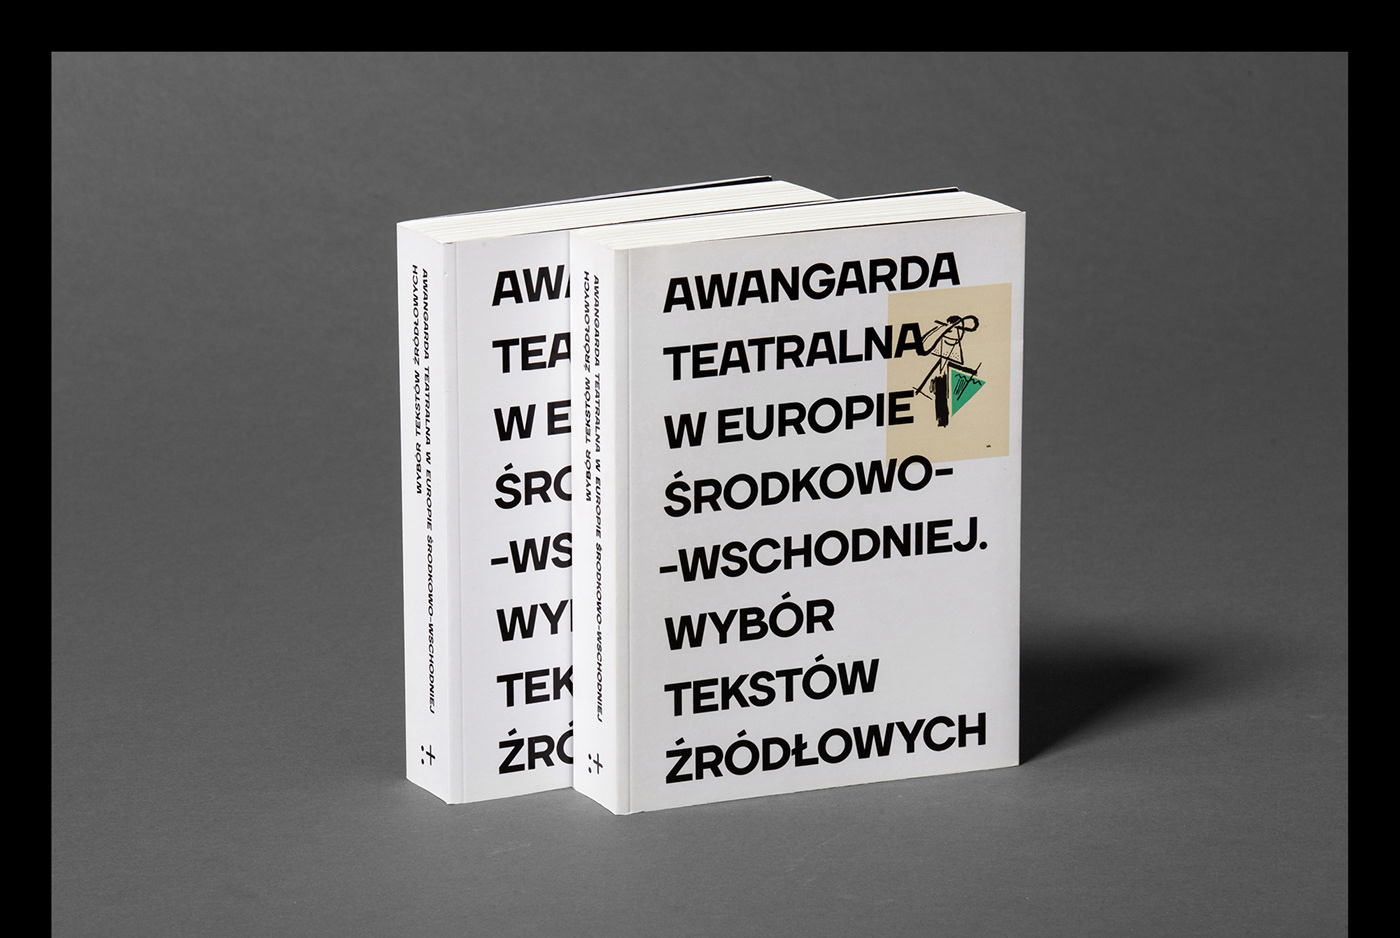 book books książka paperback print teatr Theatre typografia typography   graphic design